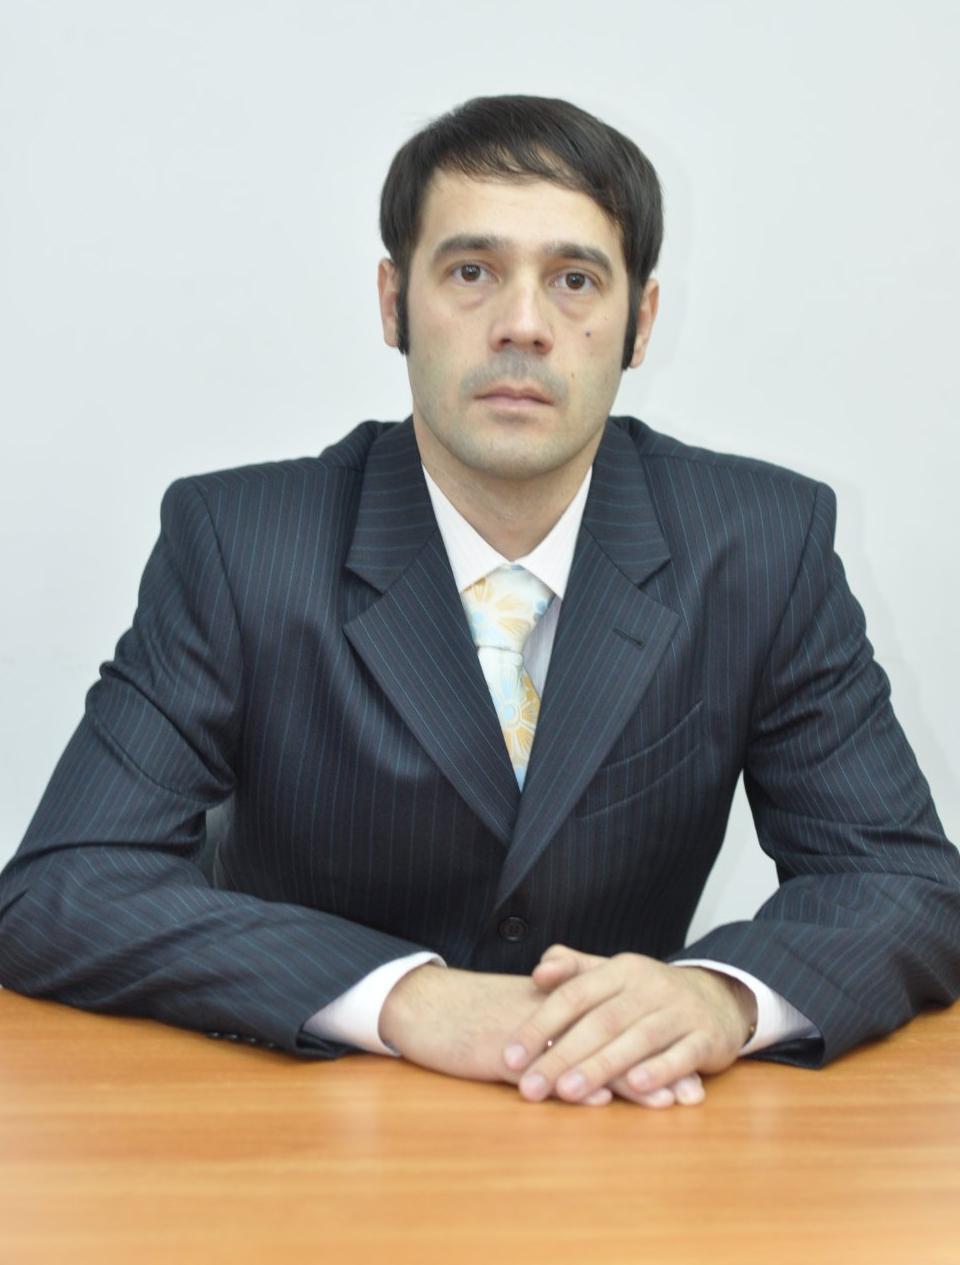 Basyirov Aizat Mirkasimovich